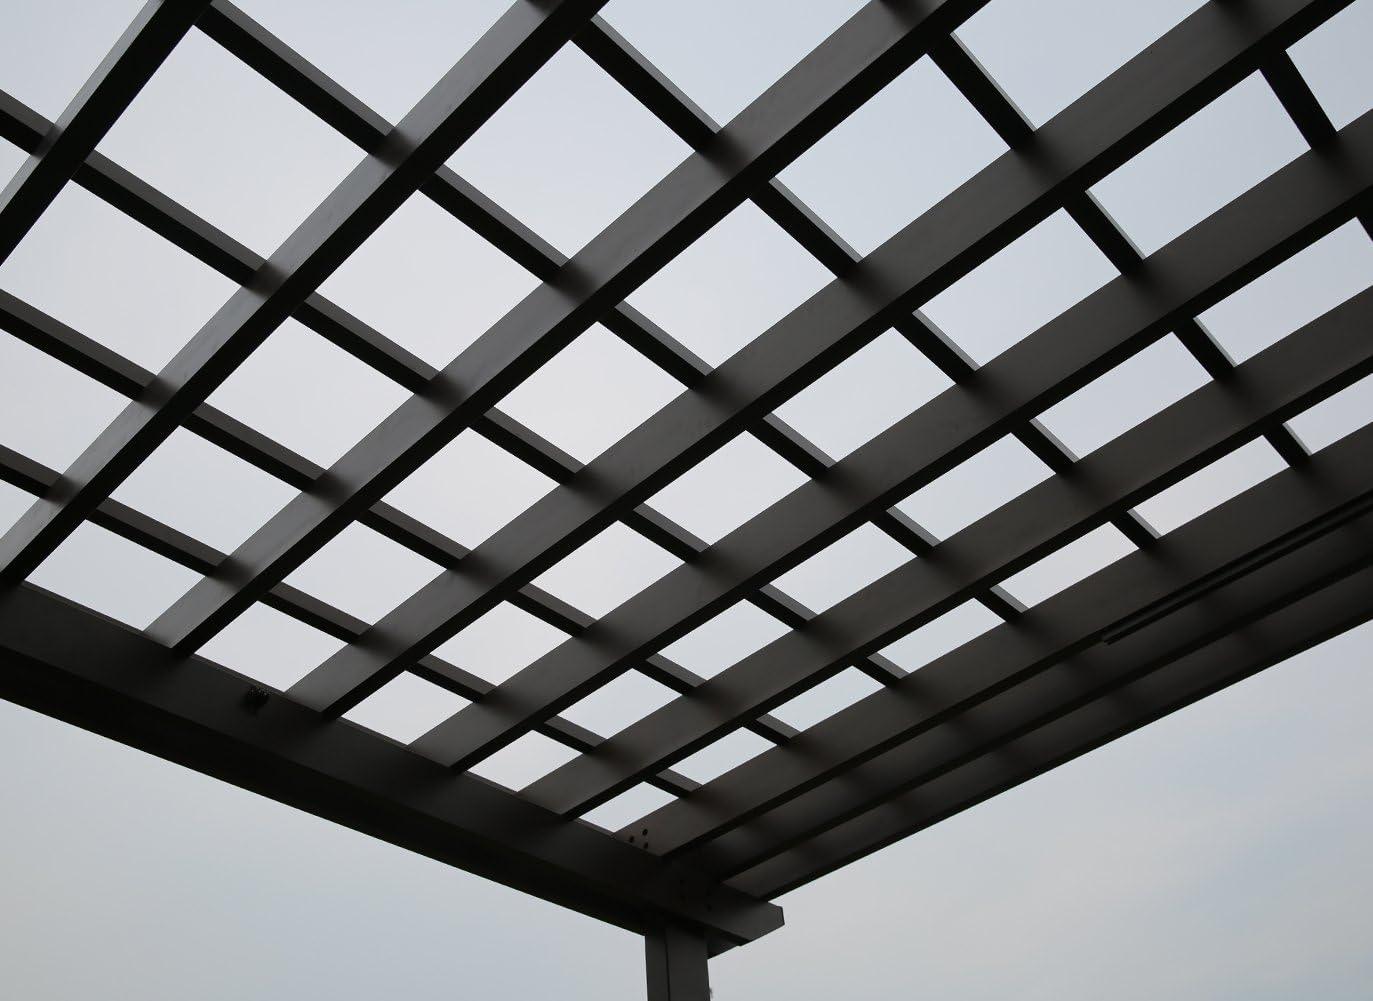 sorara Pergola Marco de aluminio al aire libre Patio Jardín Sol ...